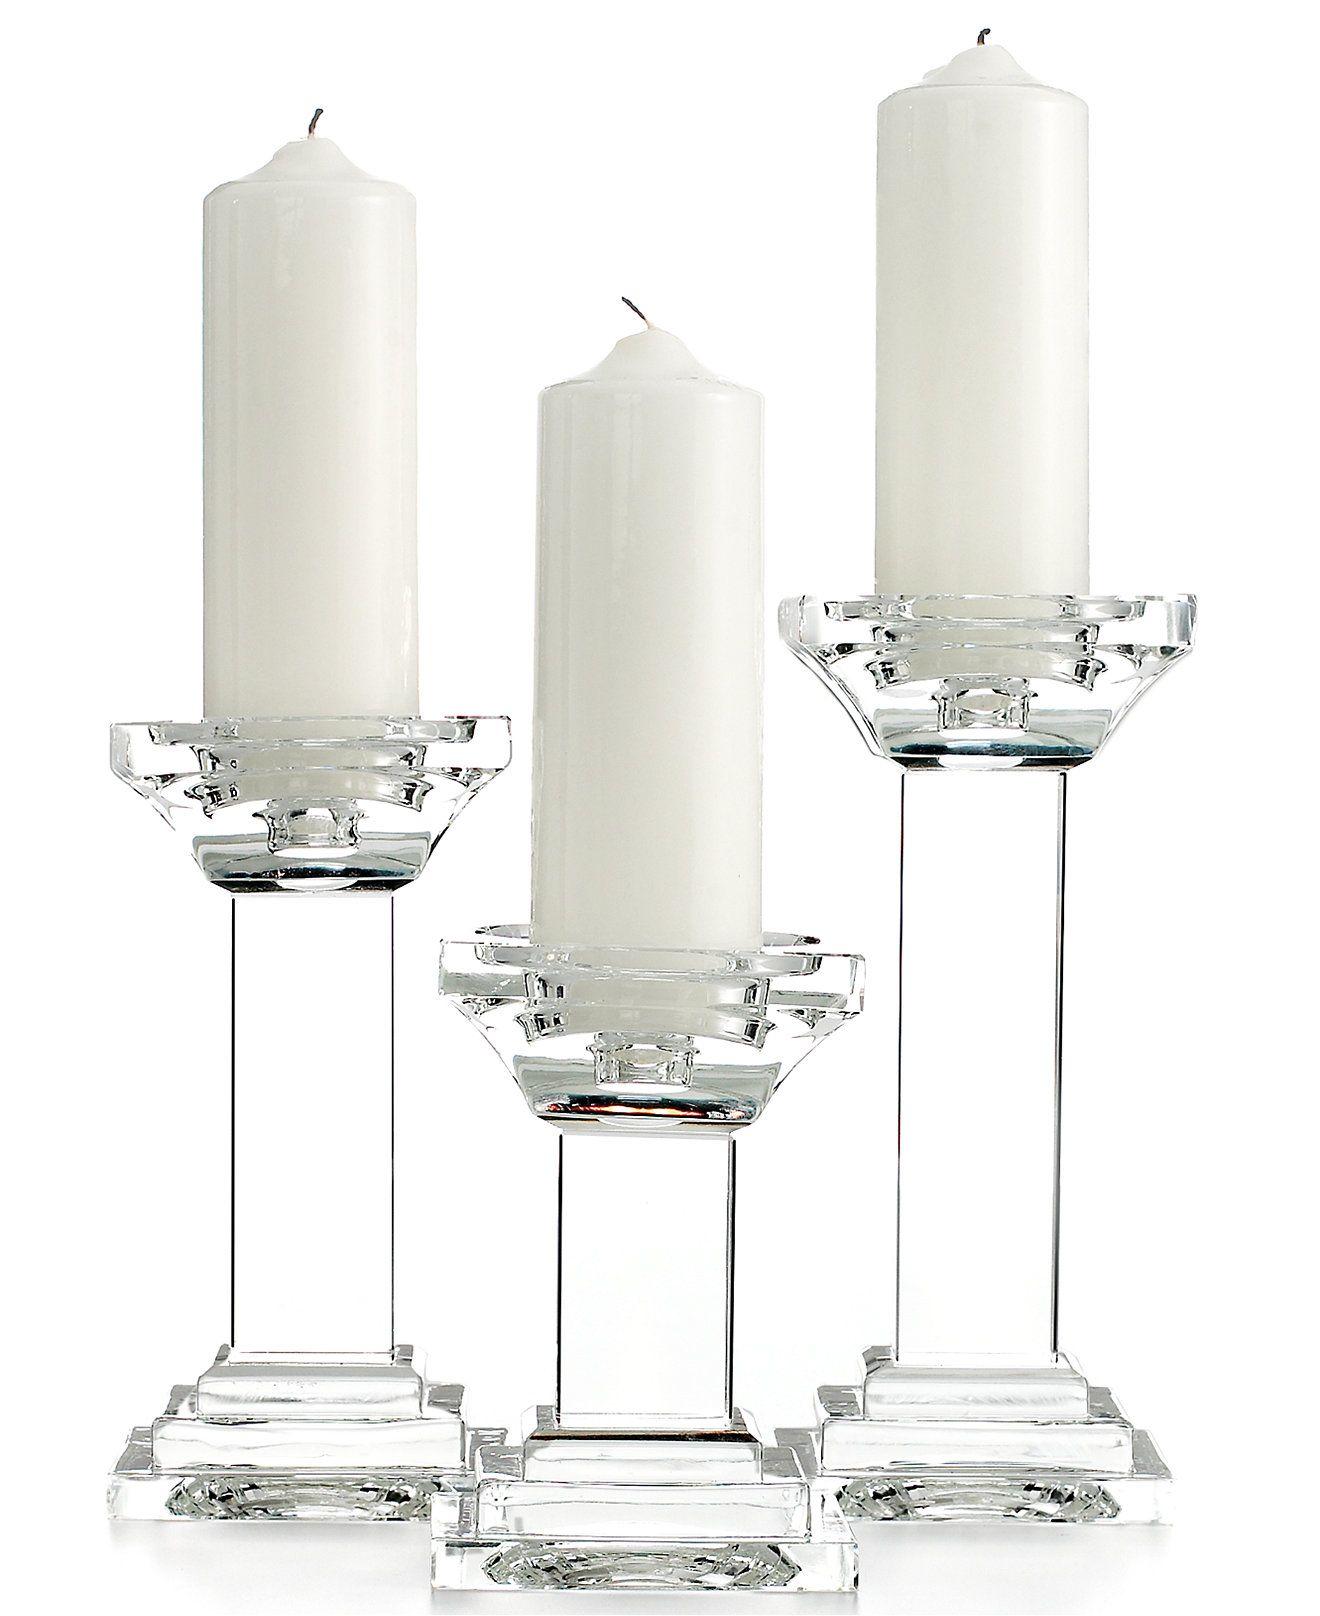 Dining Lighting By Design Candle Holders Set Of 3 Metropolitan